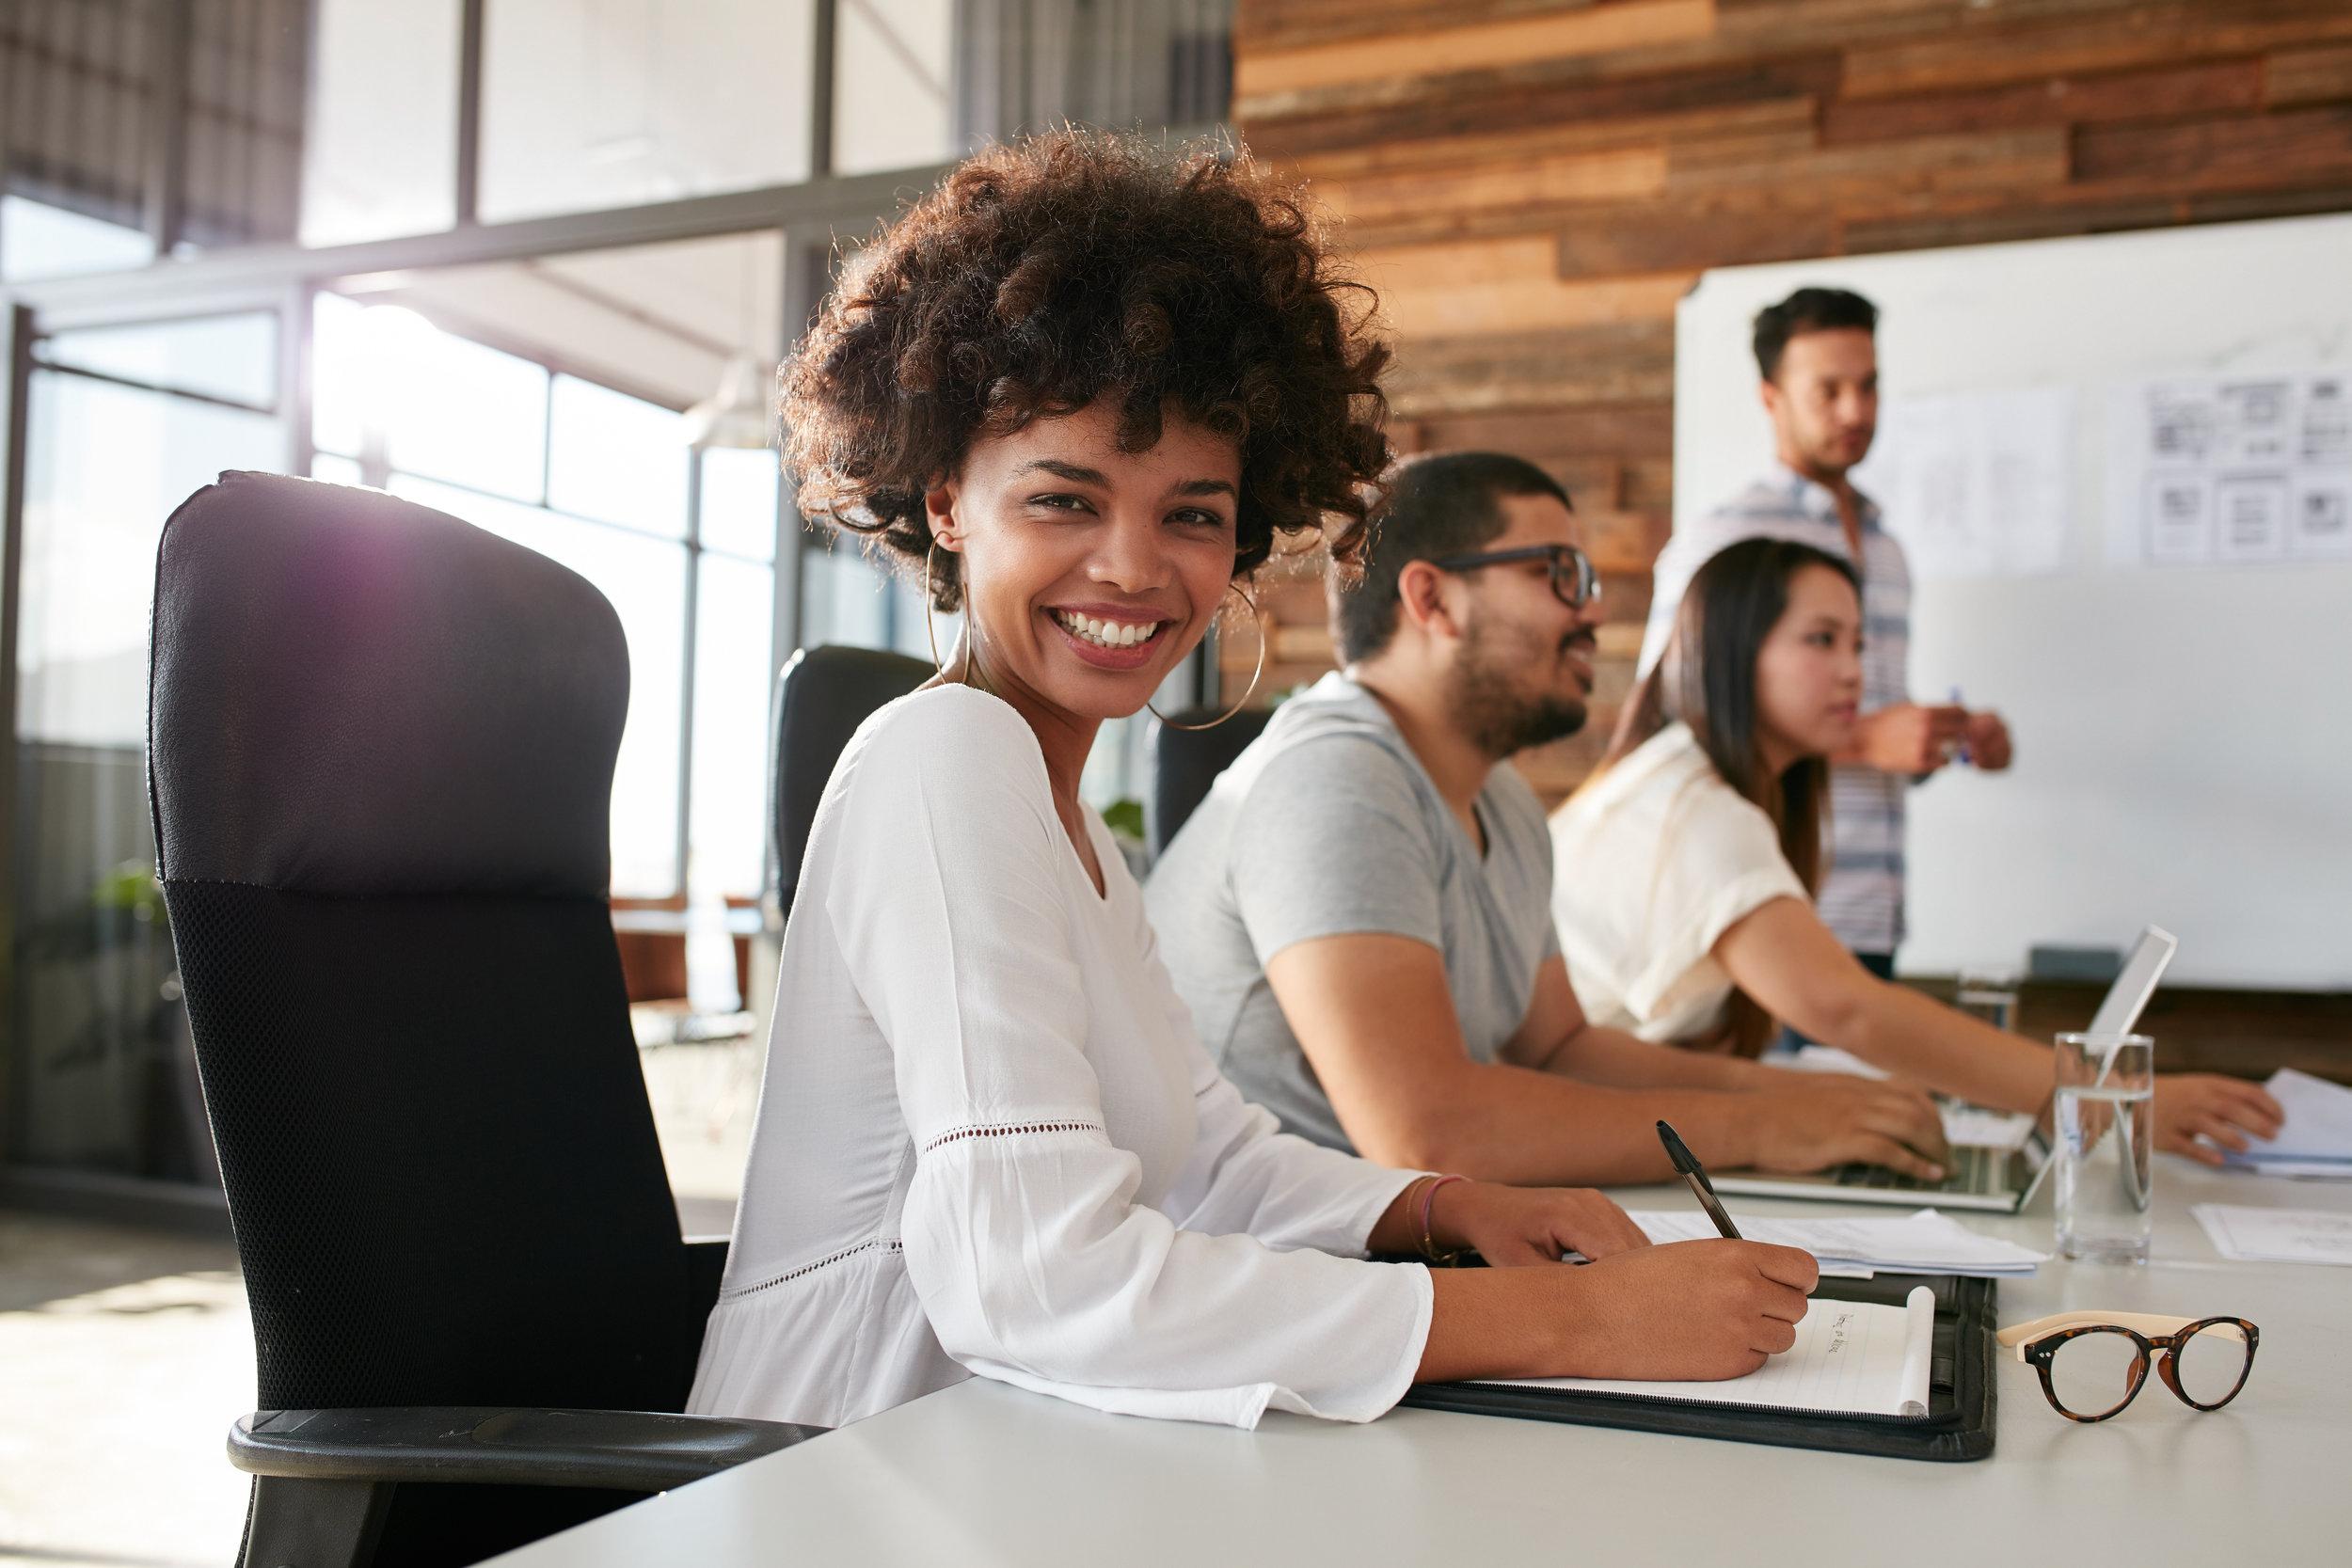 Krystal-Hicks-JobTalk-Career-advice.jpg